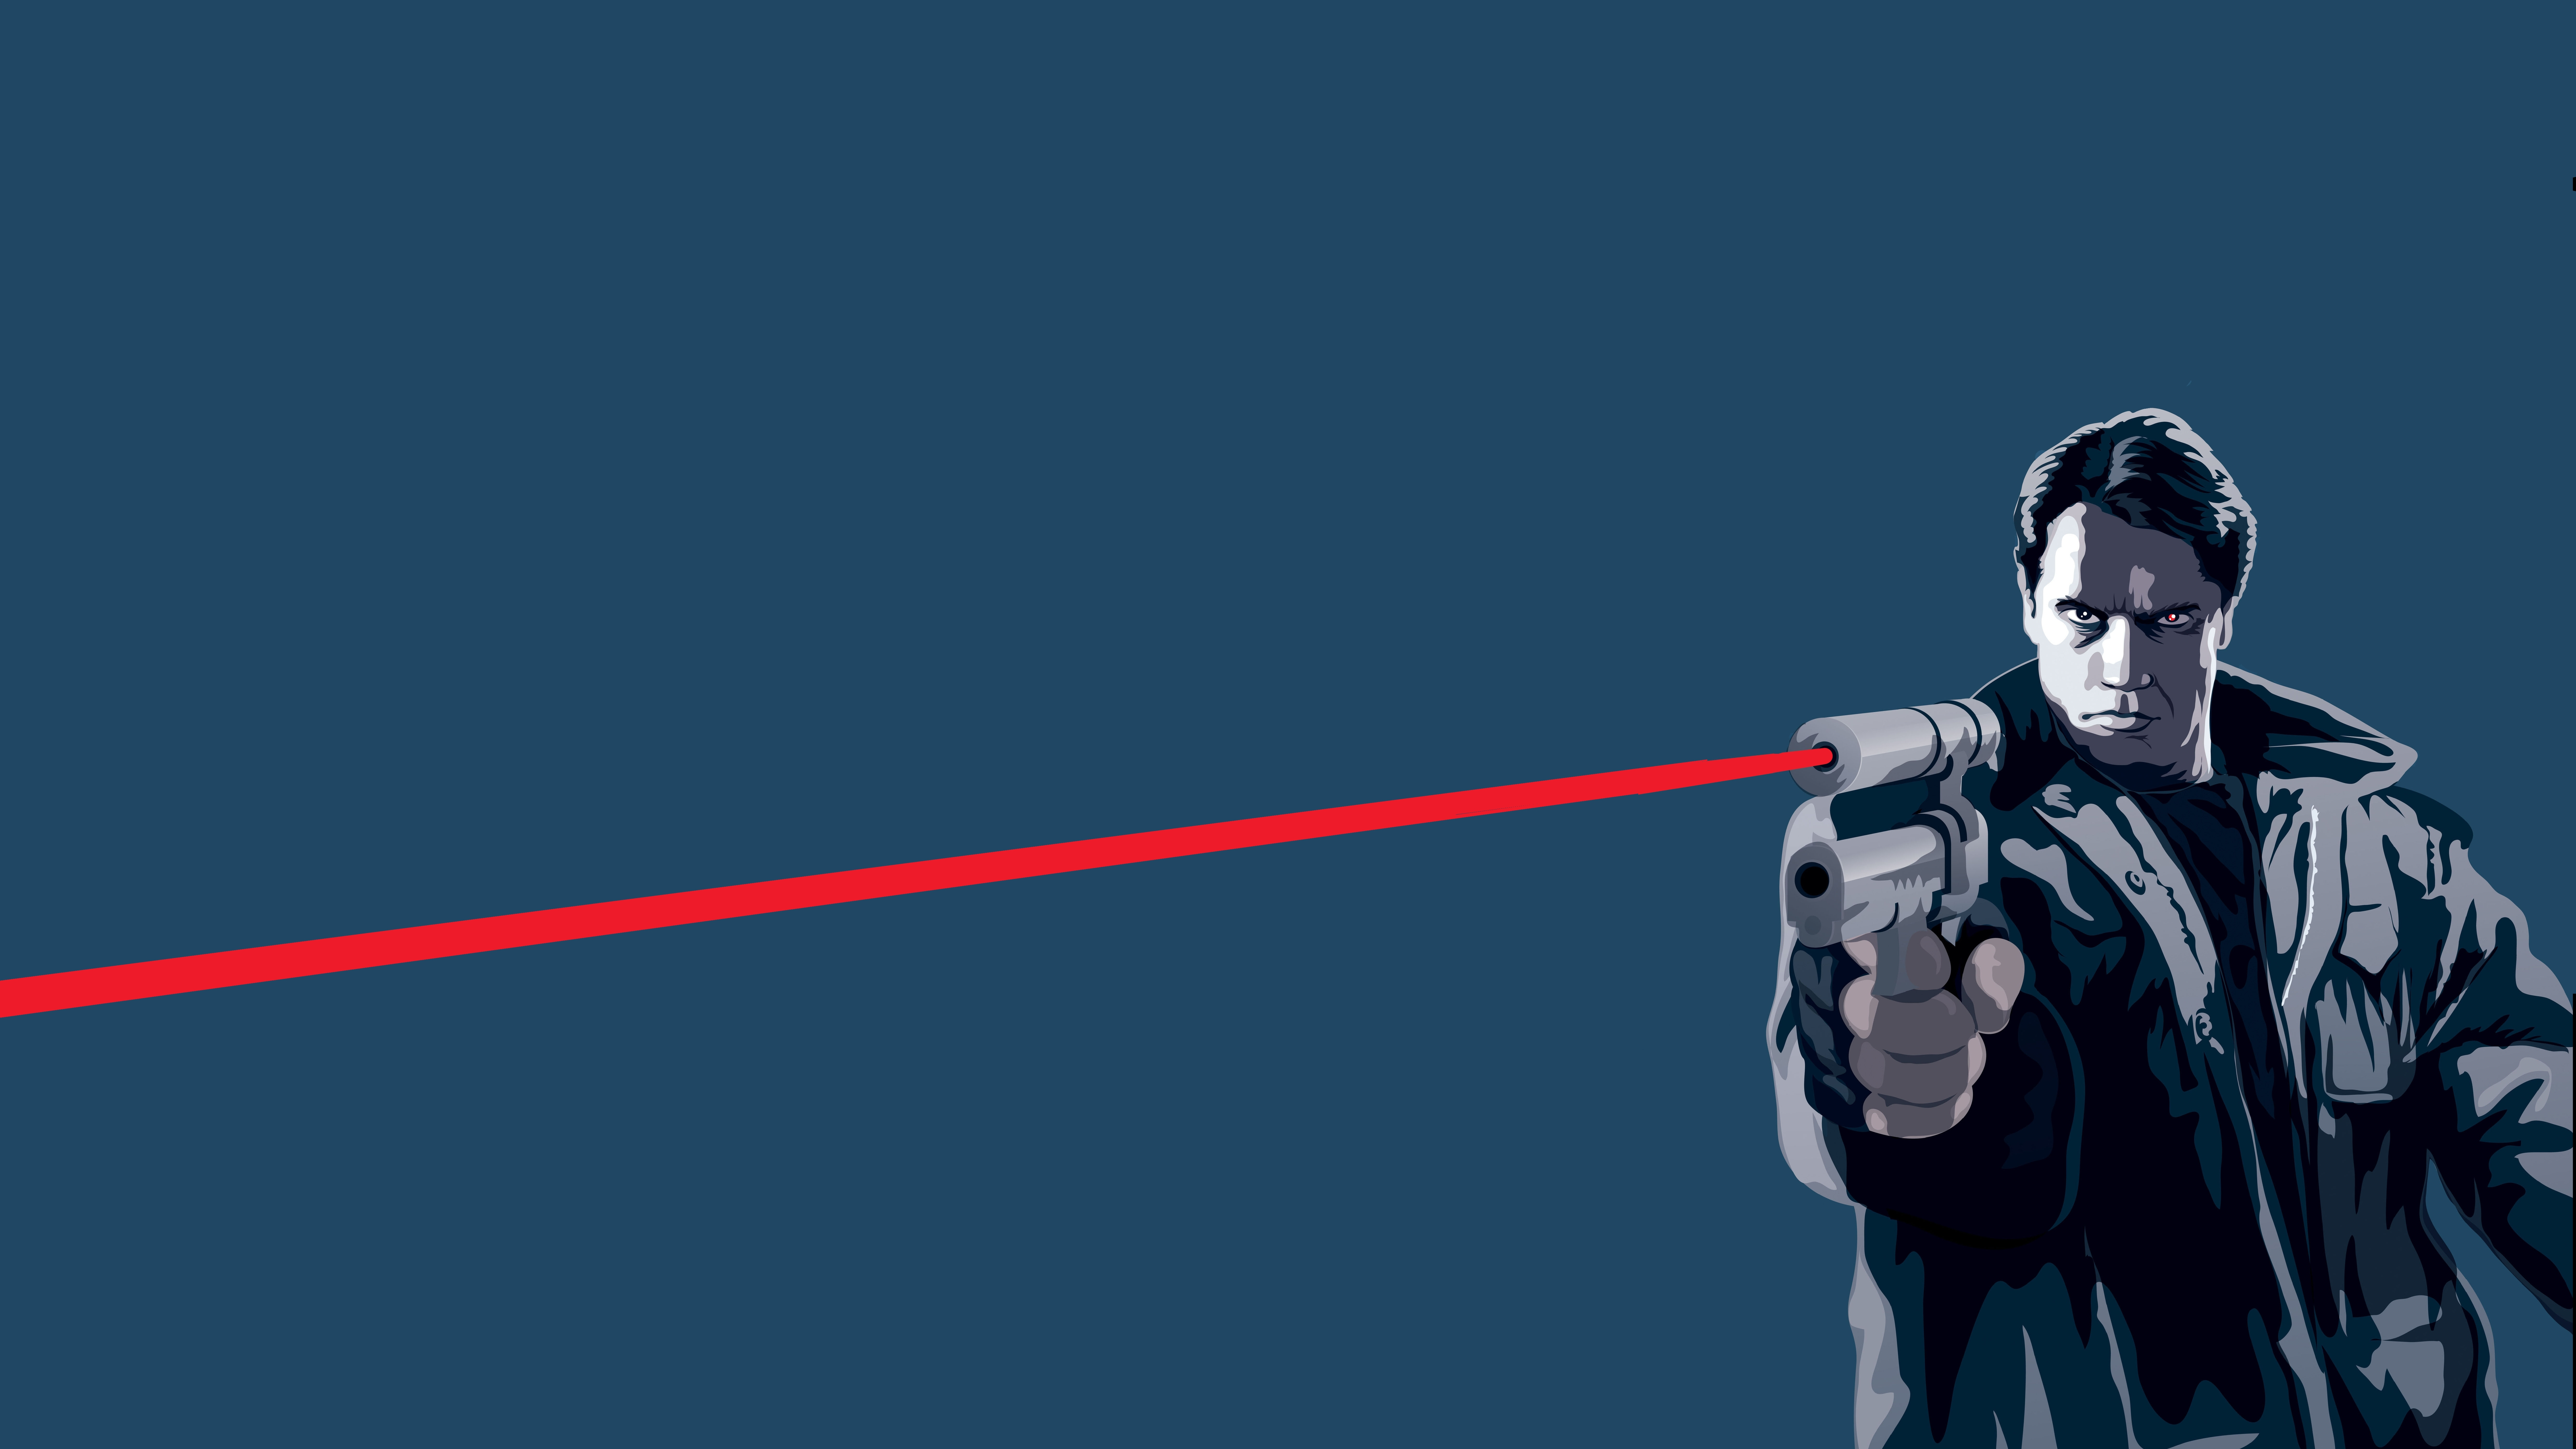 Terminator 8k Ultra Fondo De Pantalla Hd Fondo De